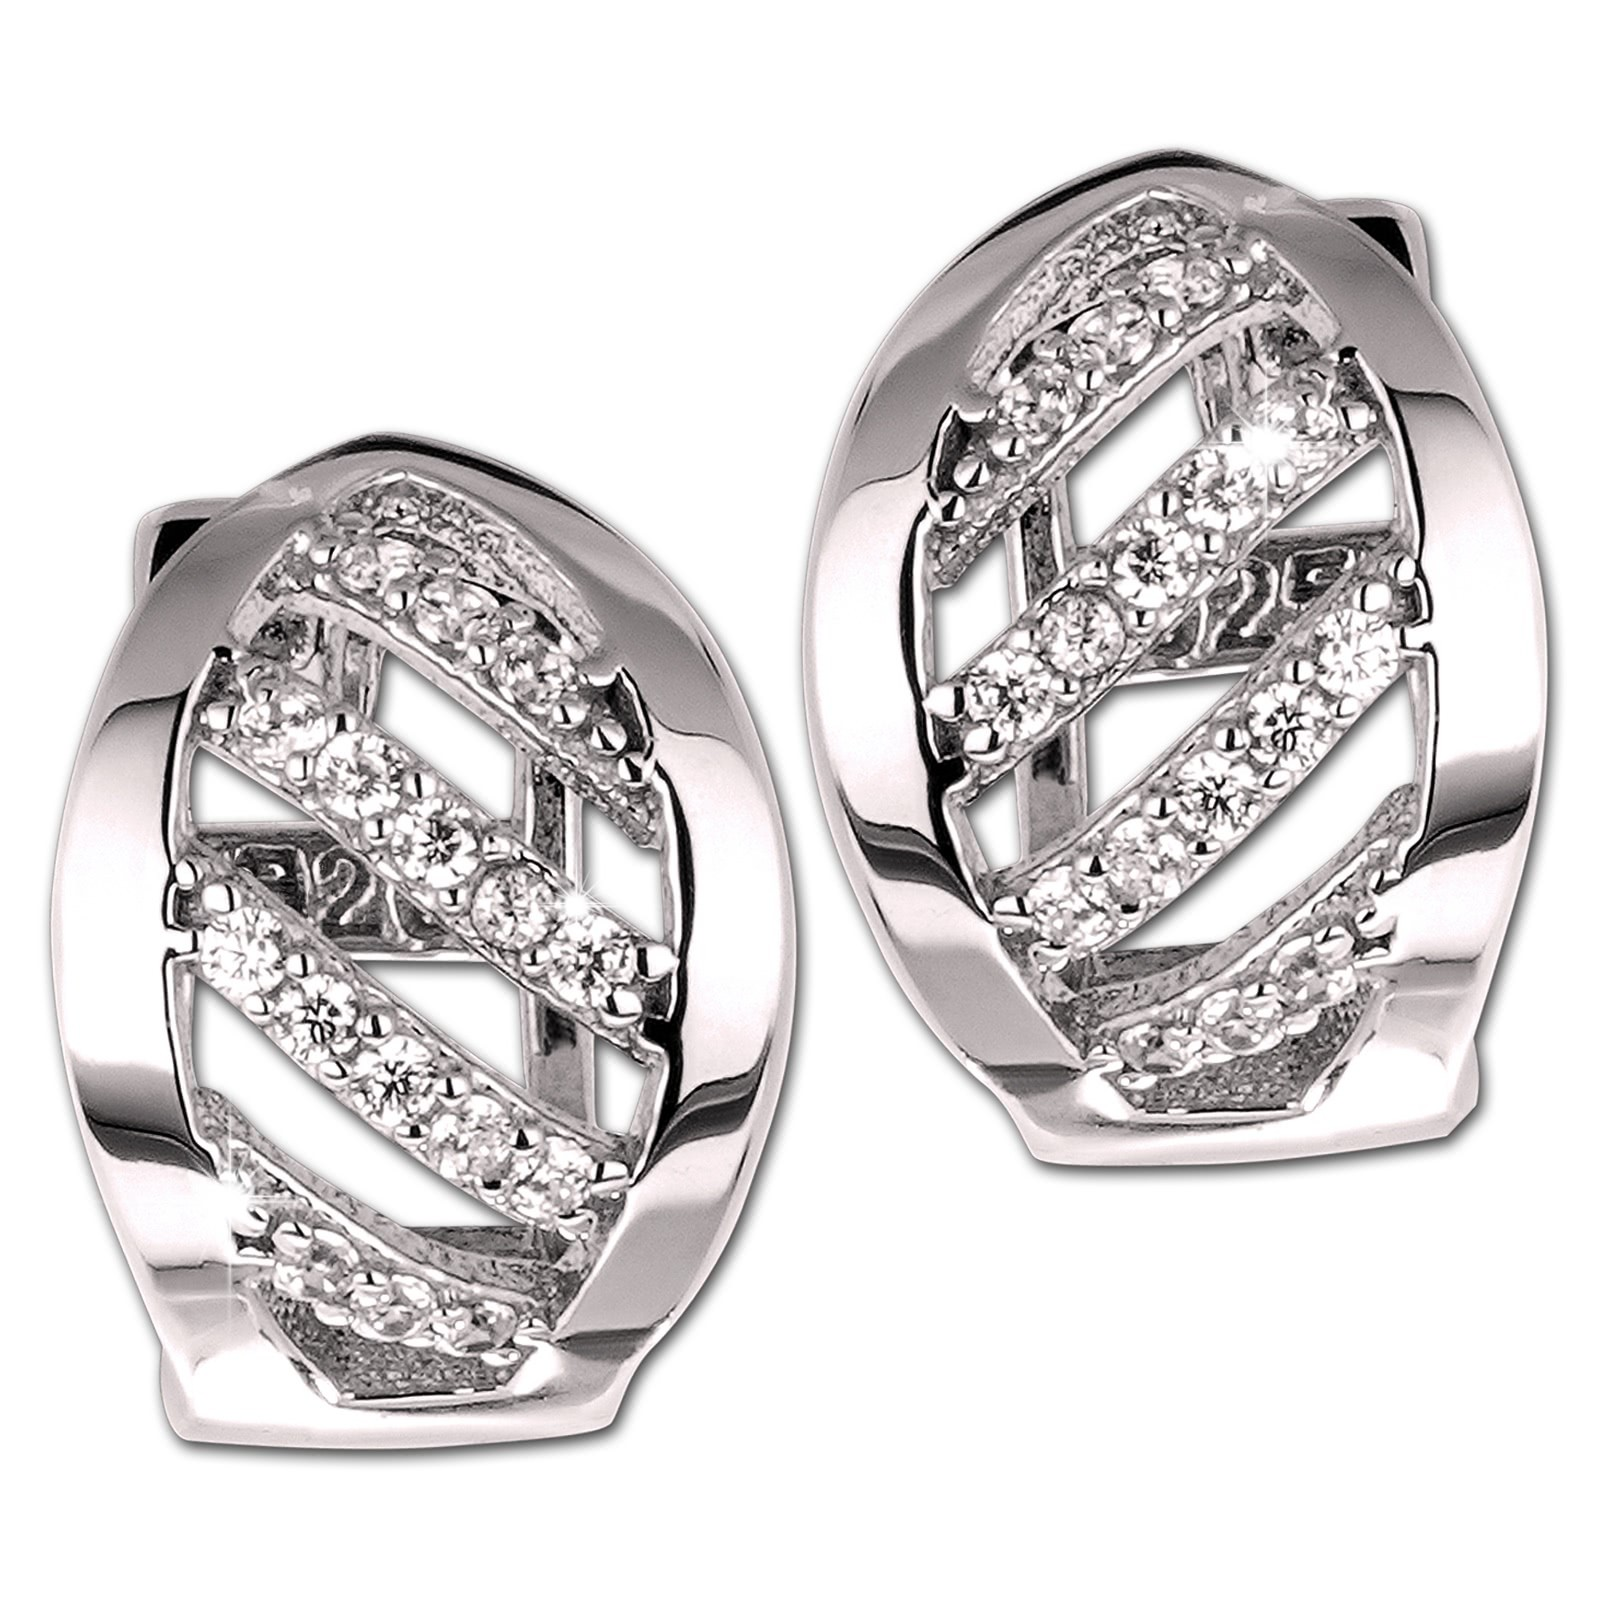 SilberDream Creole Blatt Zirkonia weiß 925 Sterling Silber Damen SDO4365W